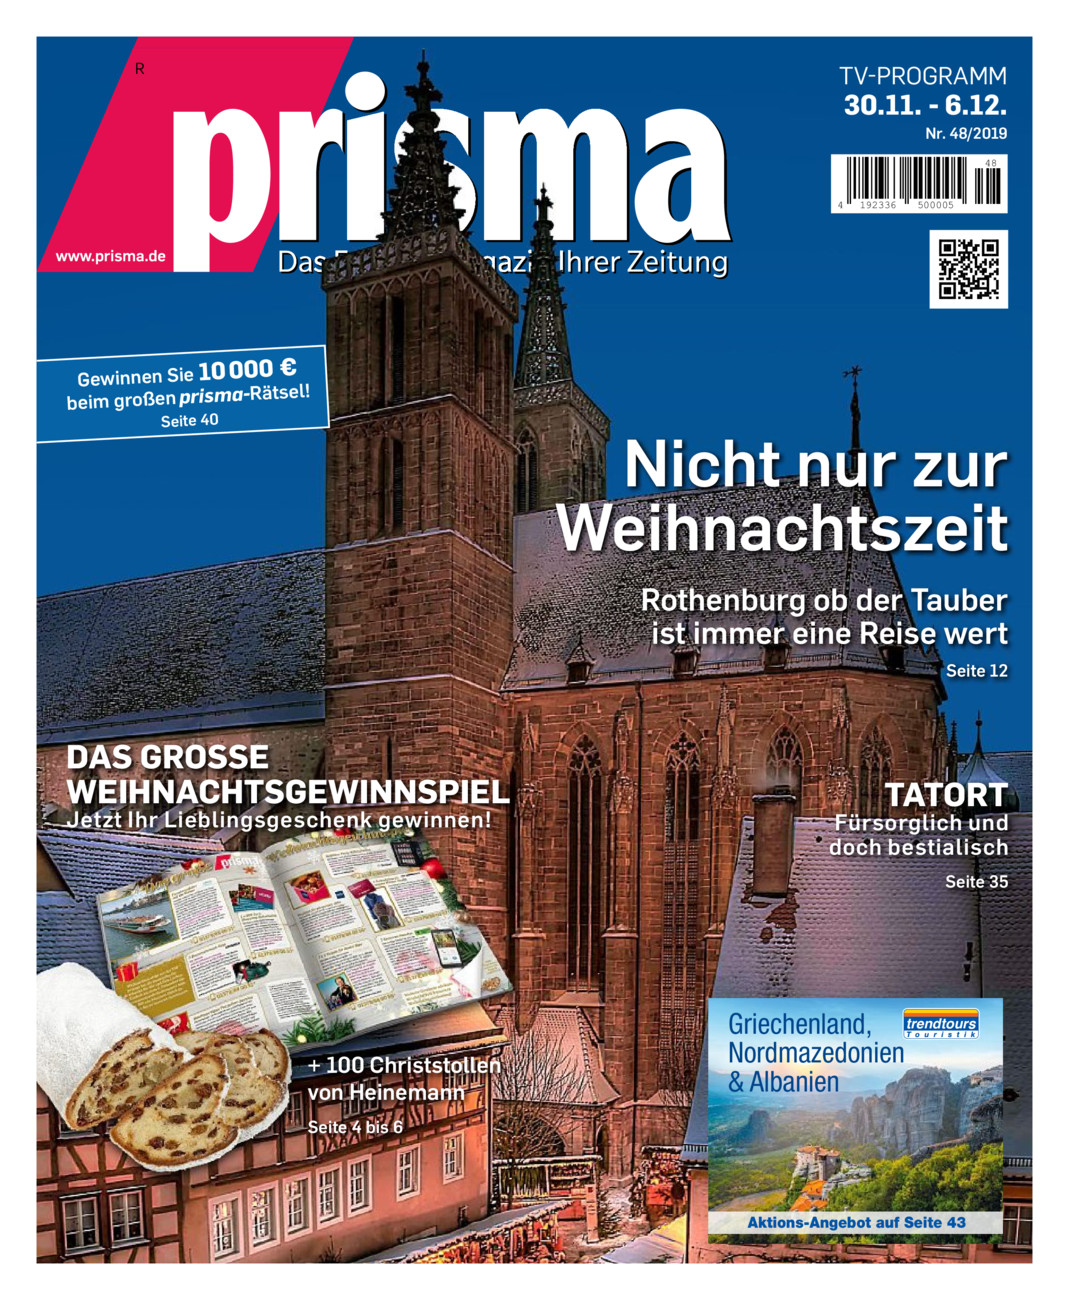 Prisma 30.11. - 06.12.